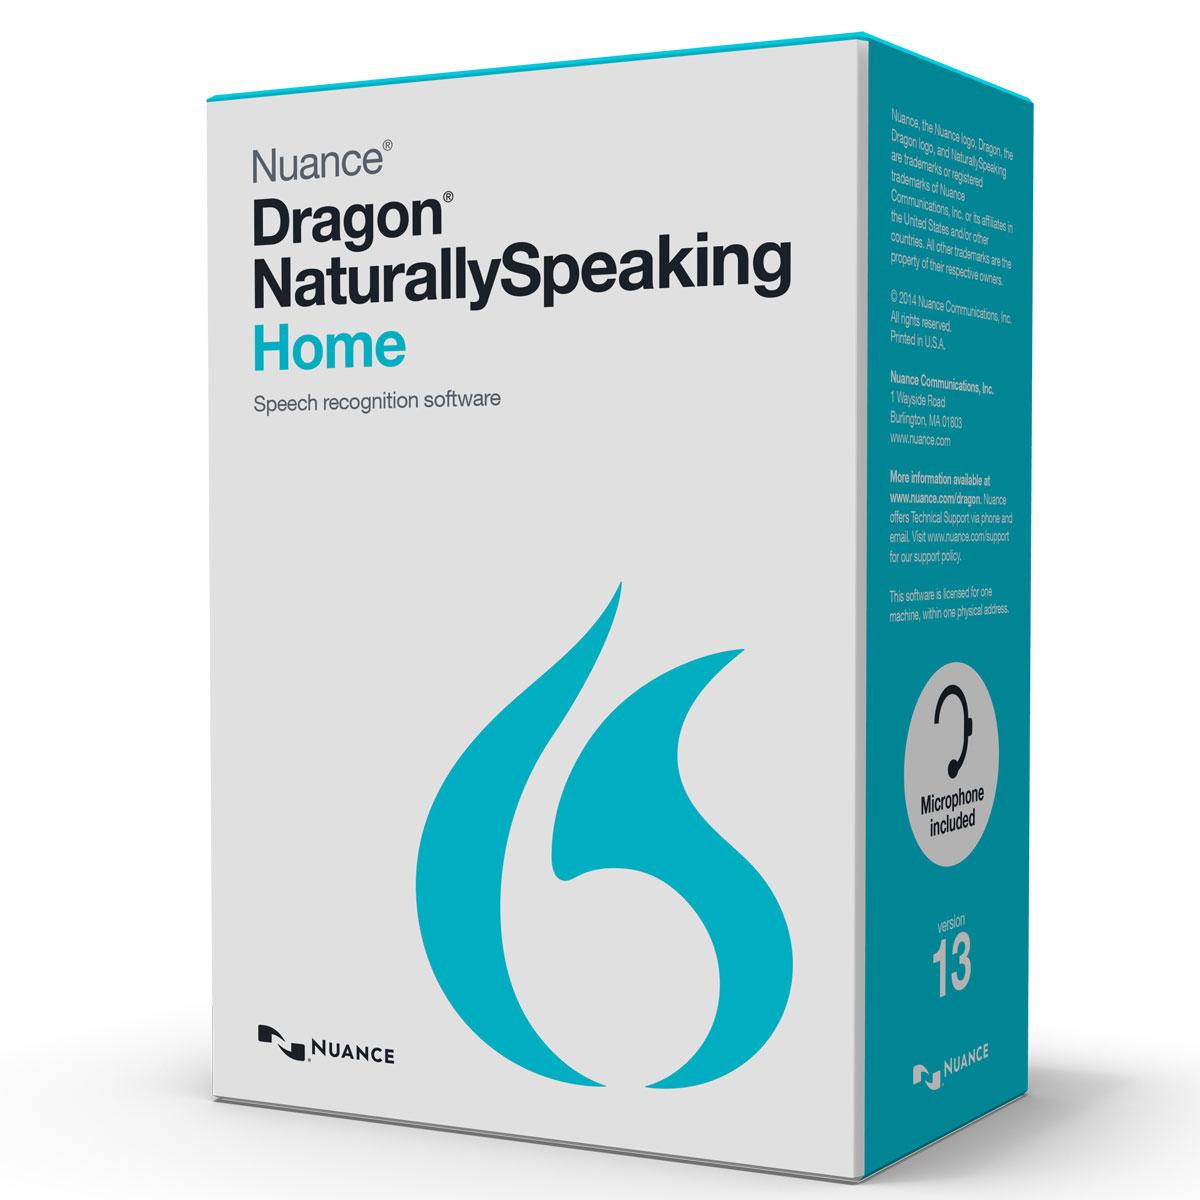 nuance dragon naturallyspeaking 13 home fran ais windows logiciel reconnaissance vocale. Black Bedroom Furniture Sets. Home Design Ideas